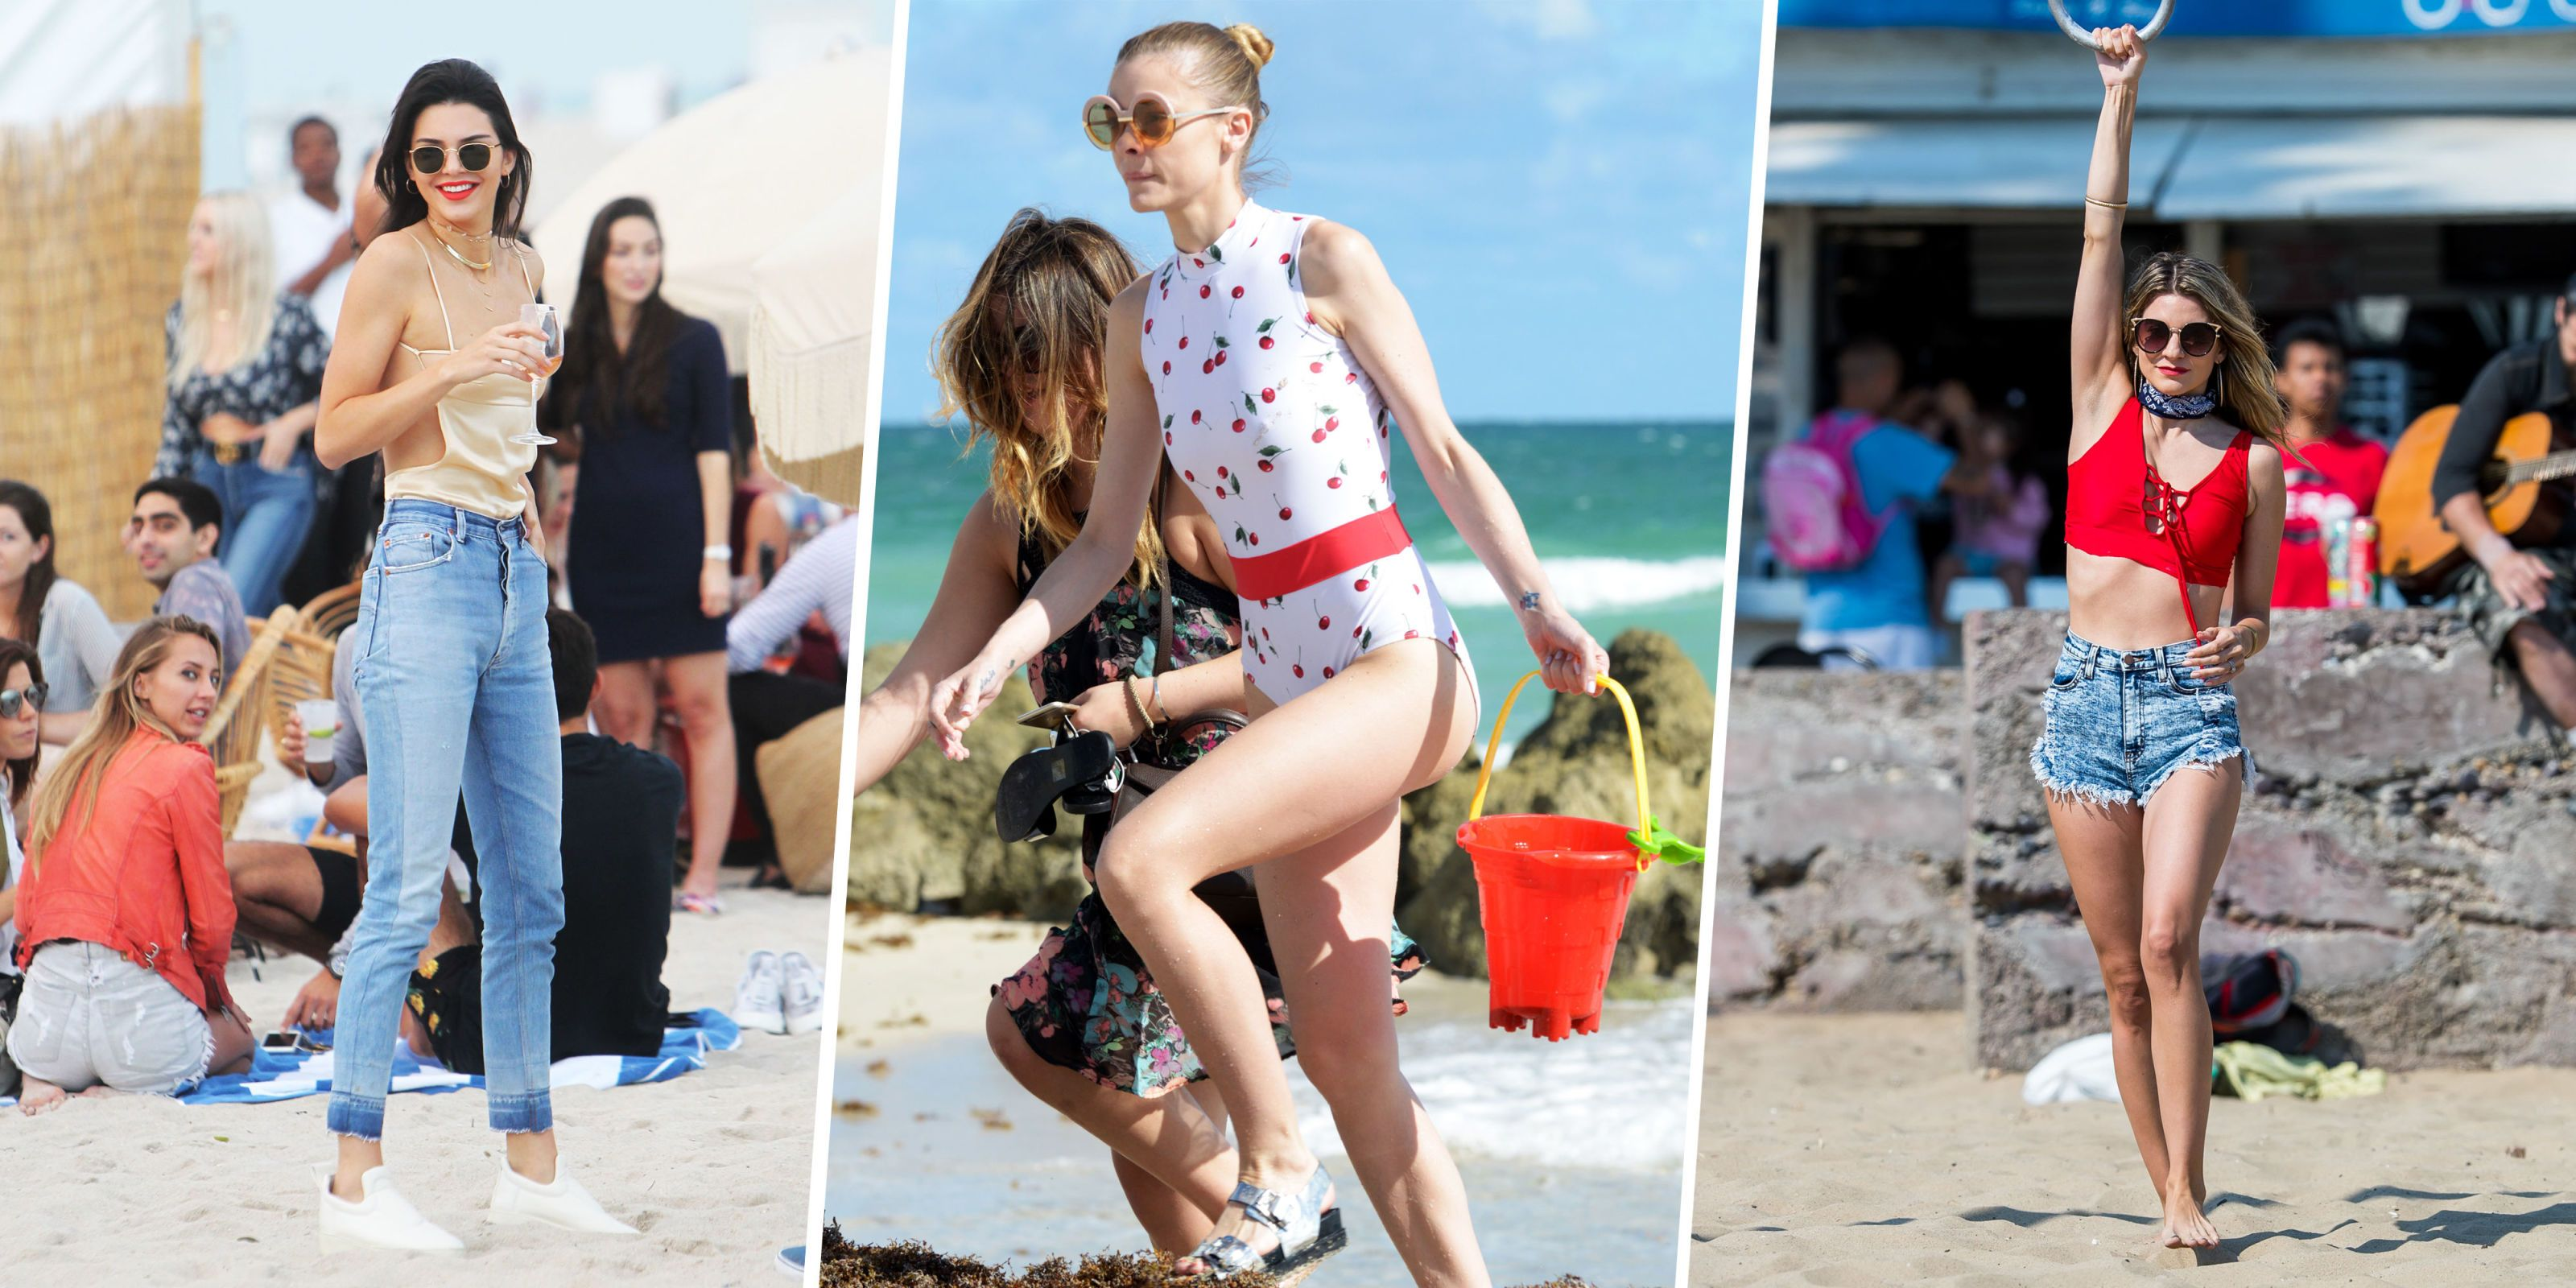 Beach bikini community fun type